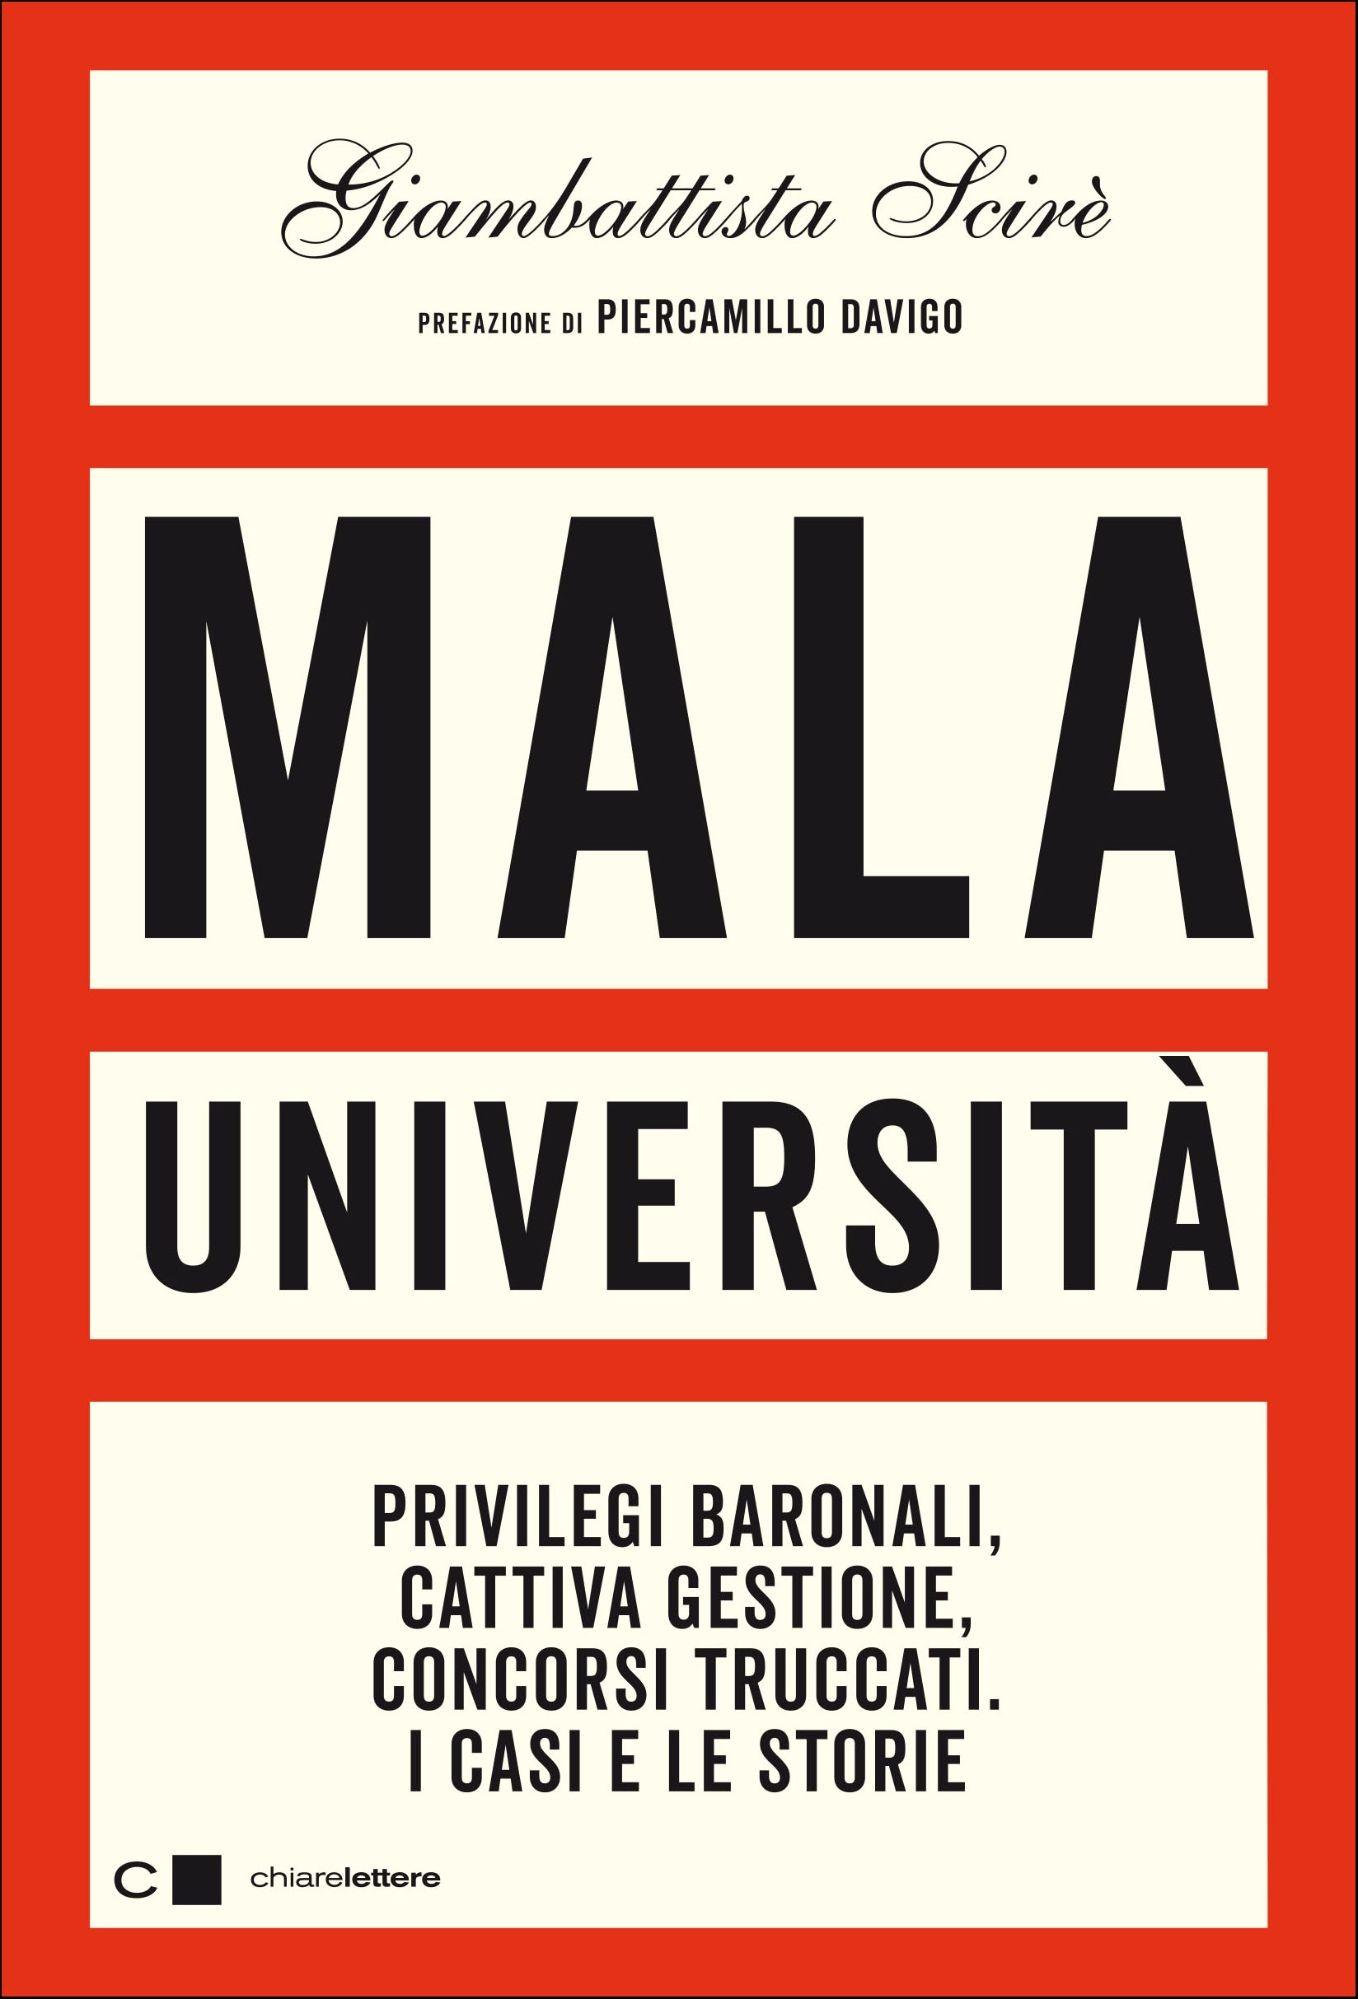 malauniversita-piatto-1632371818.jpg